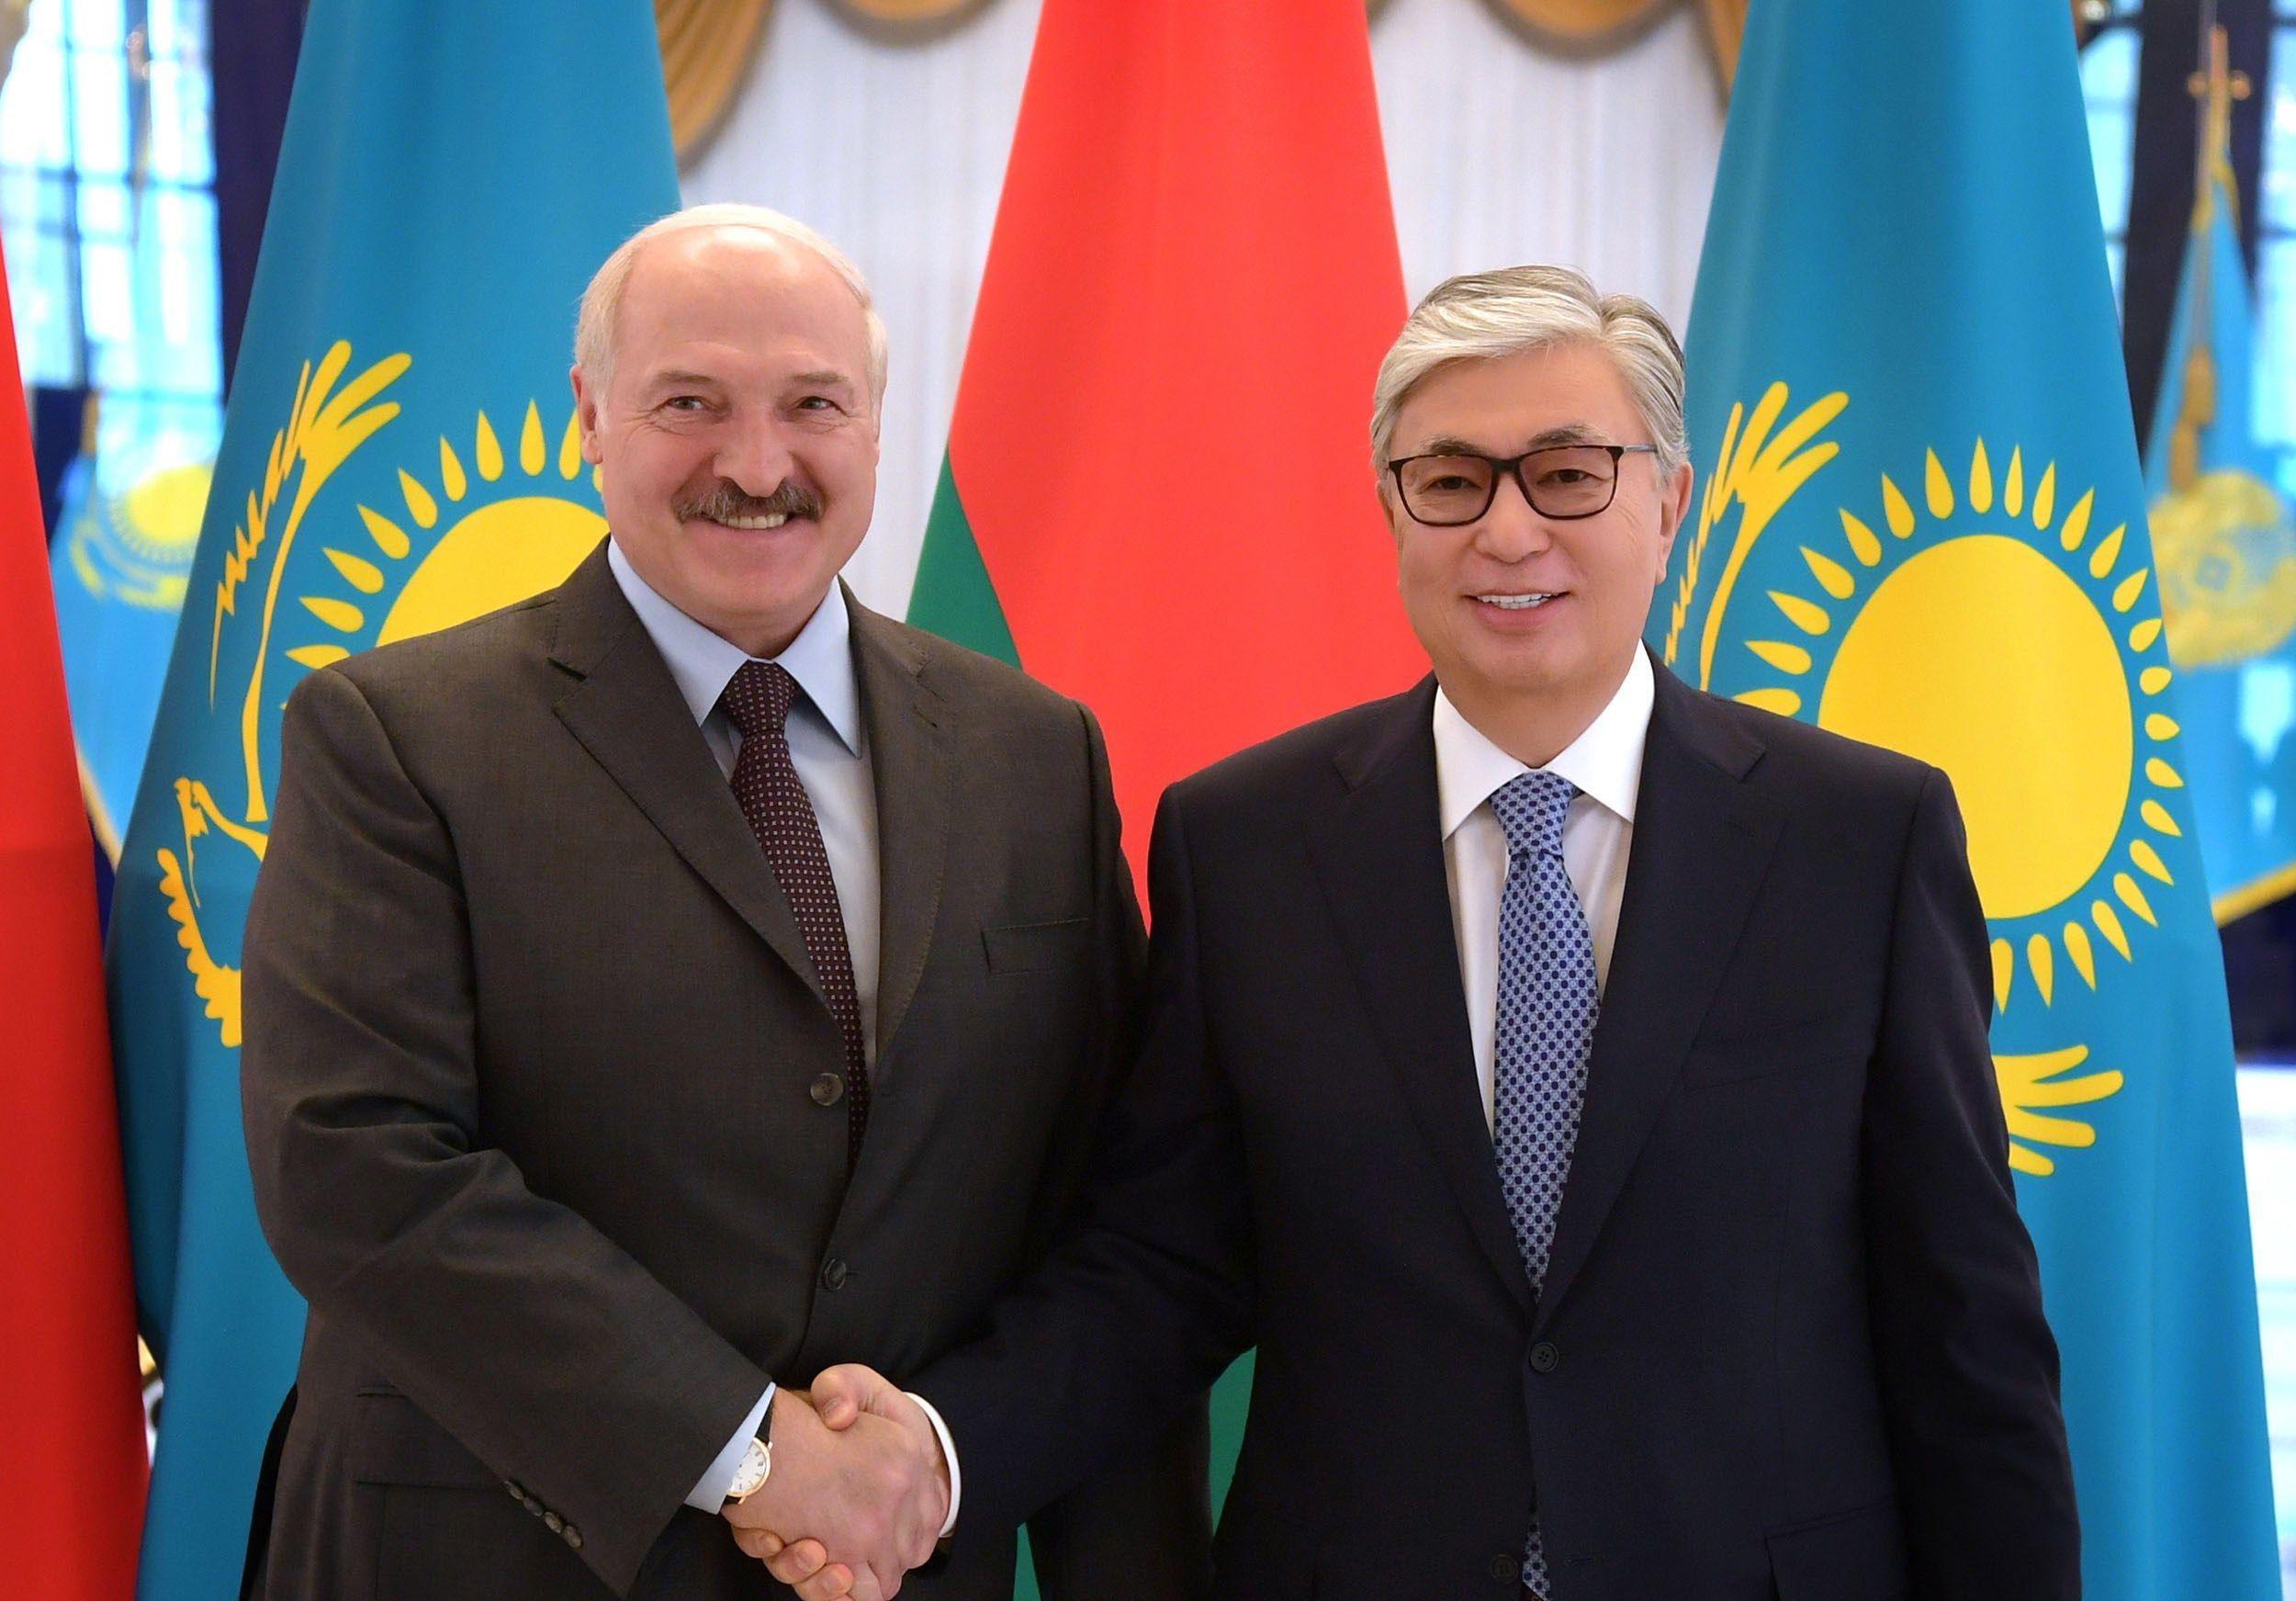 Касым-Жомарт Токаев встретился с президентами Беларуси и Кыргызстана - Kapital.kz